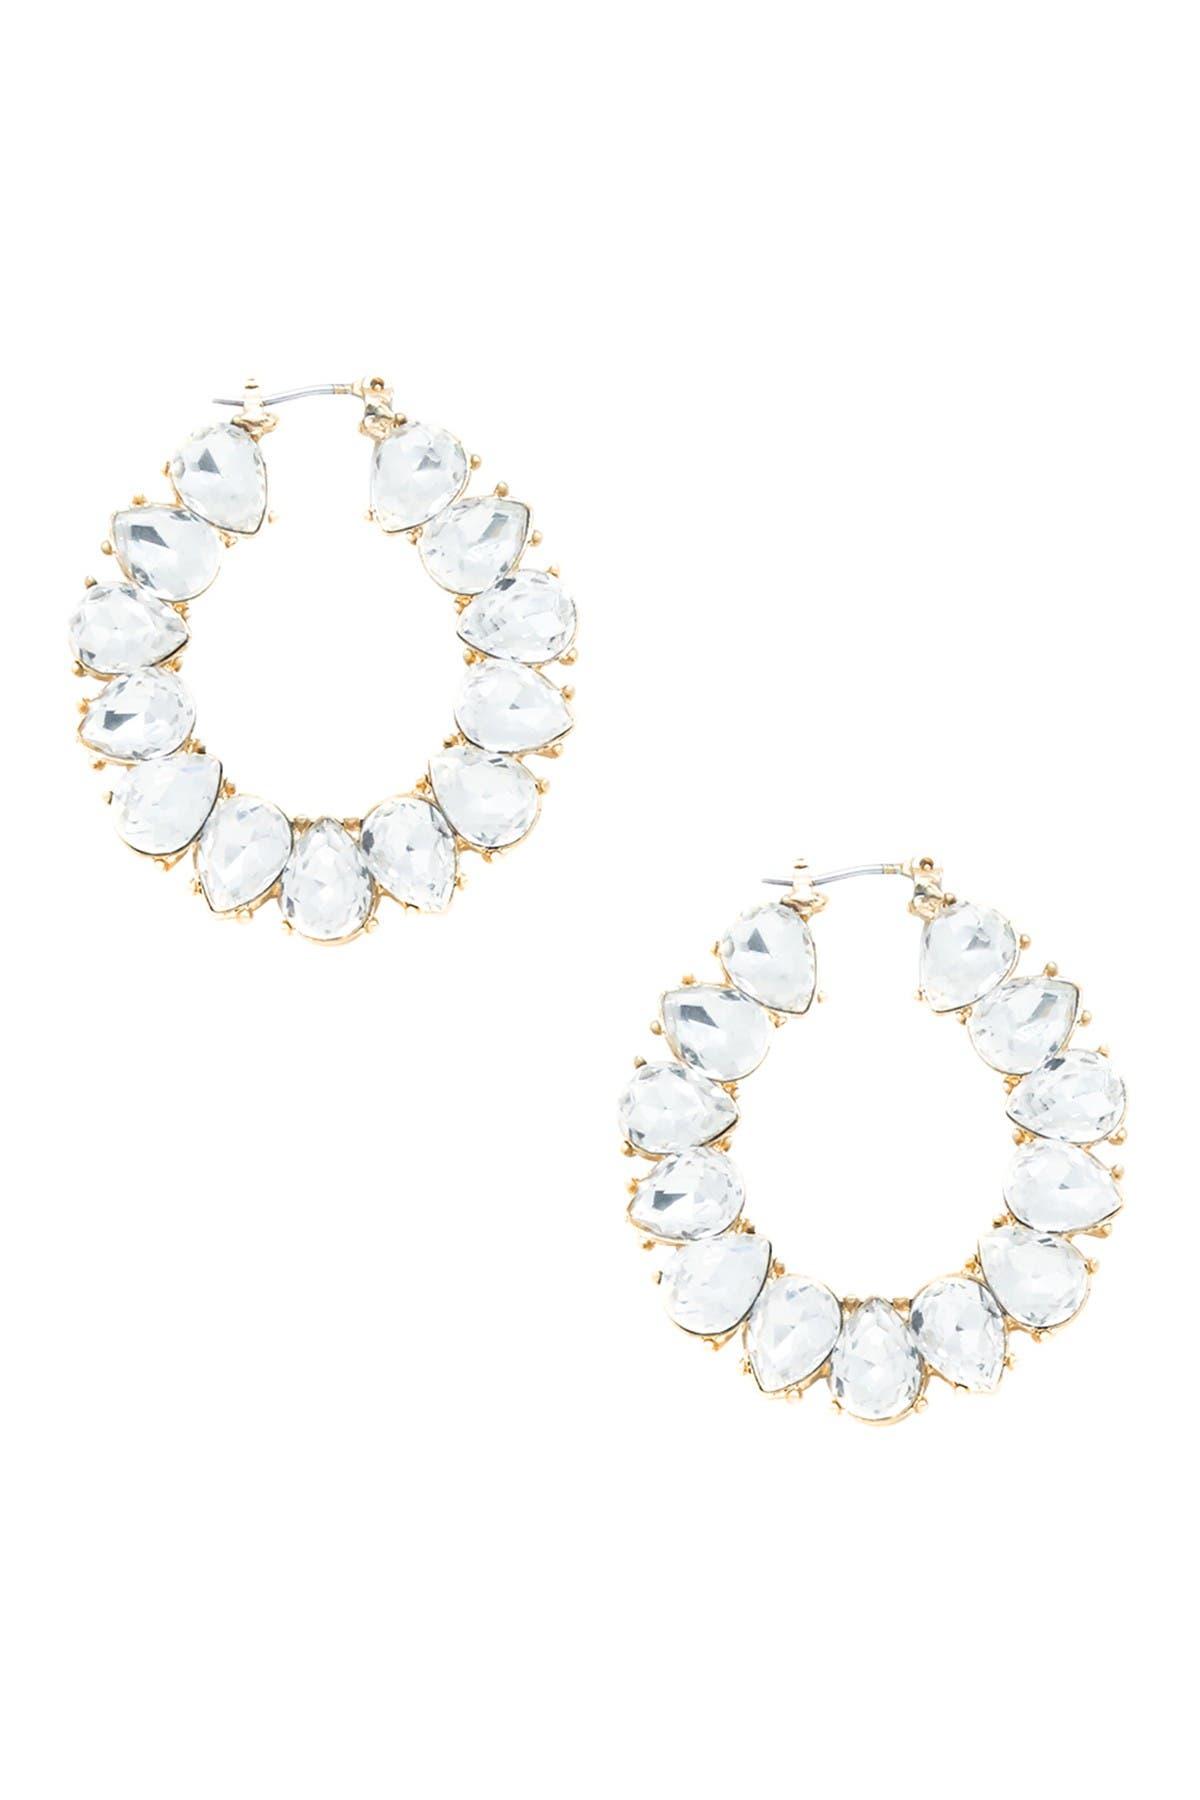 Image of Ettika 18K Gold Plated Statement Crystal Hoop Earrings